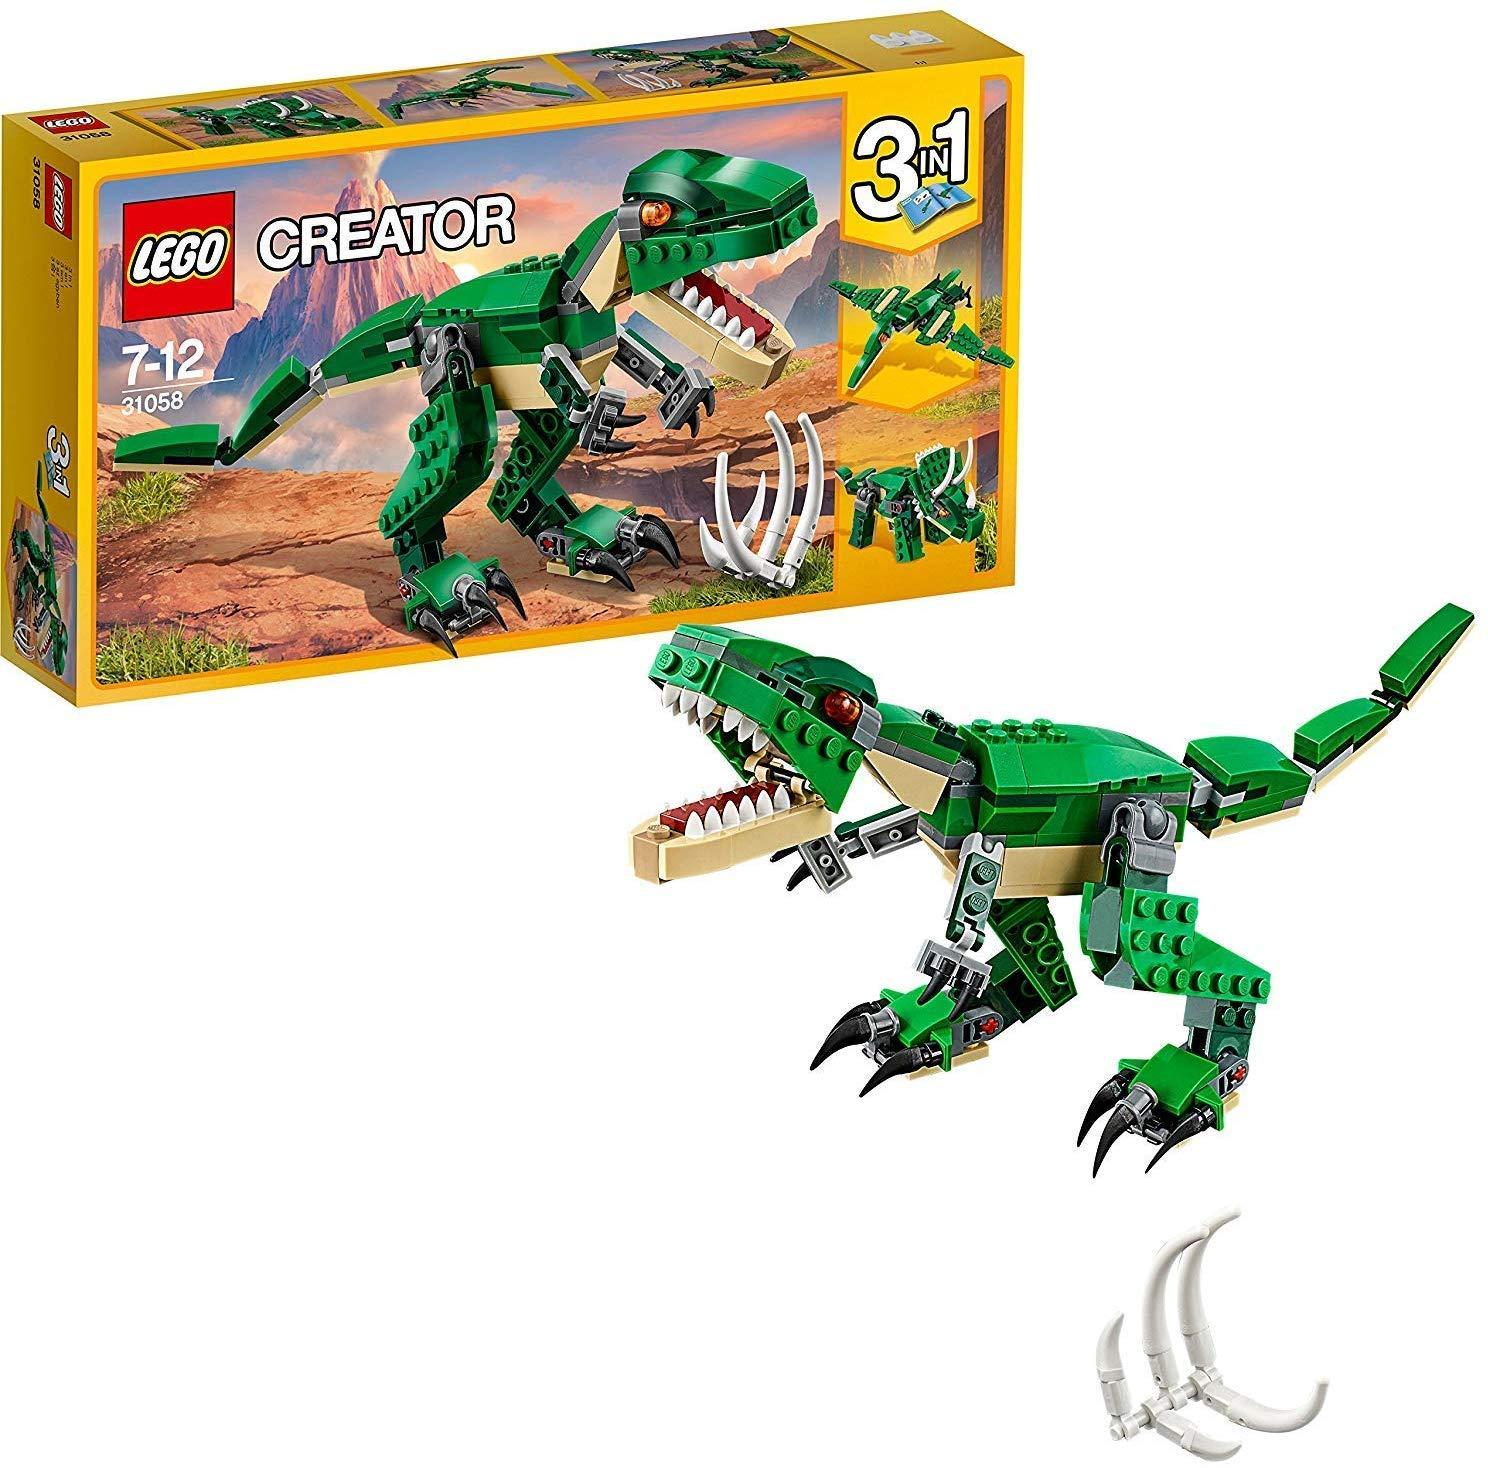 LEGO 乐高 拼插类 玩具 Creator 创意百变系列 凶猛霸王龙- 31058